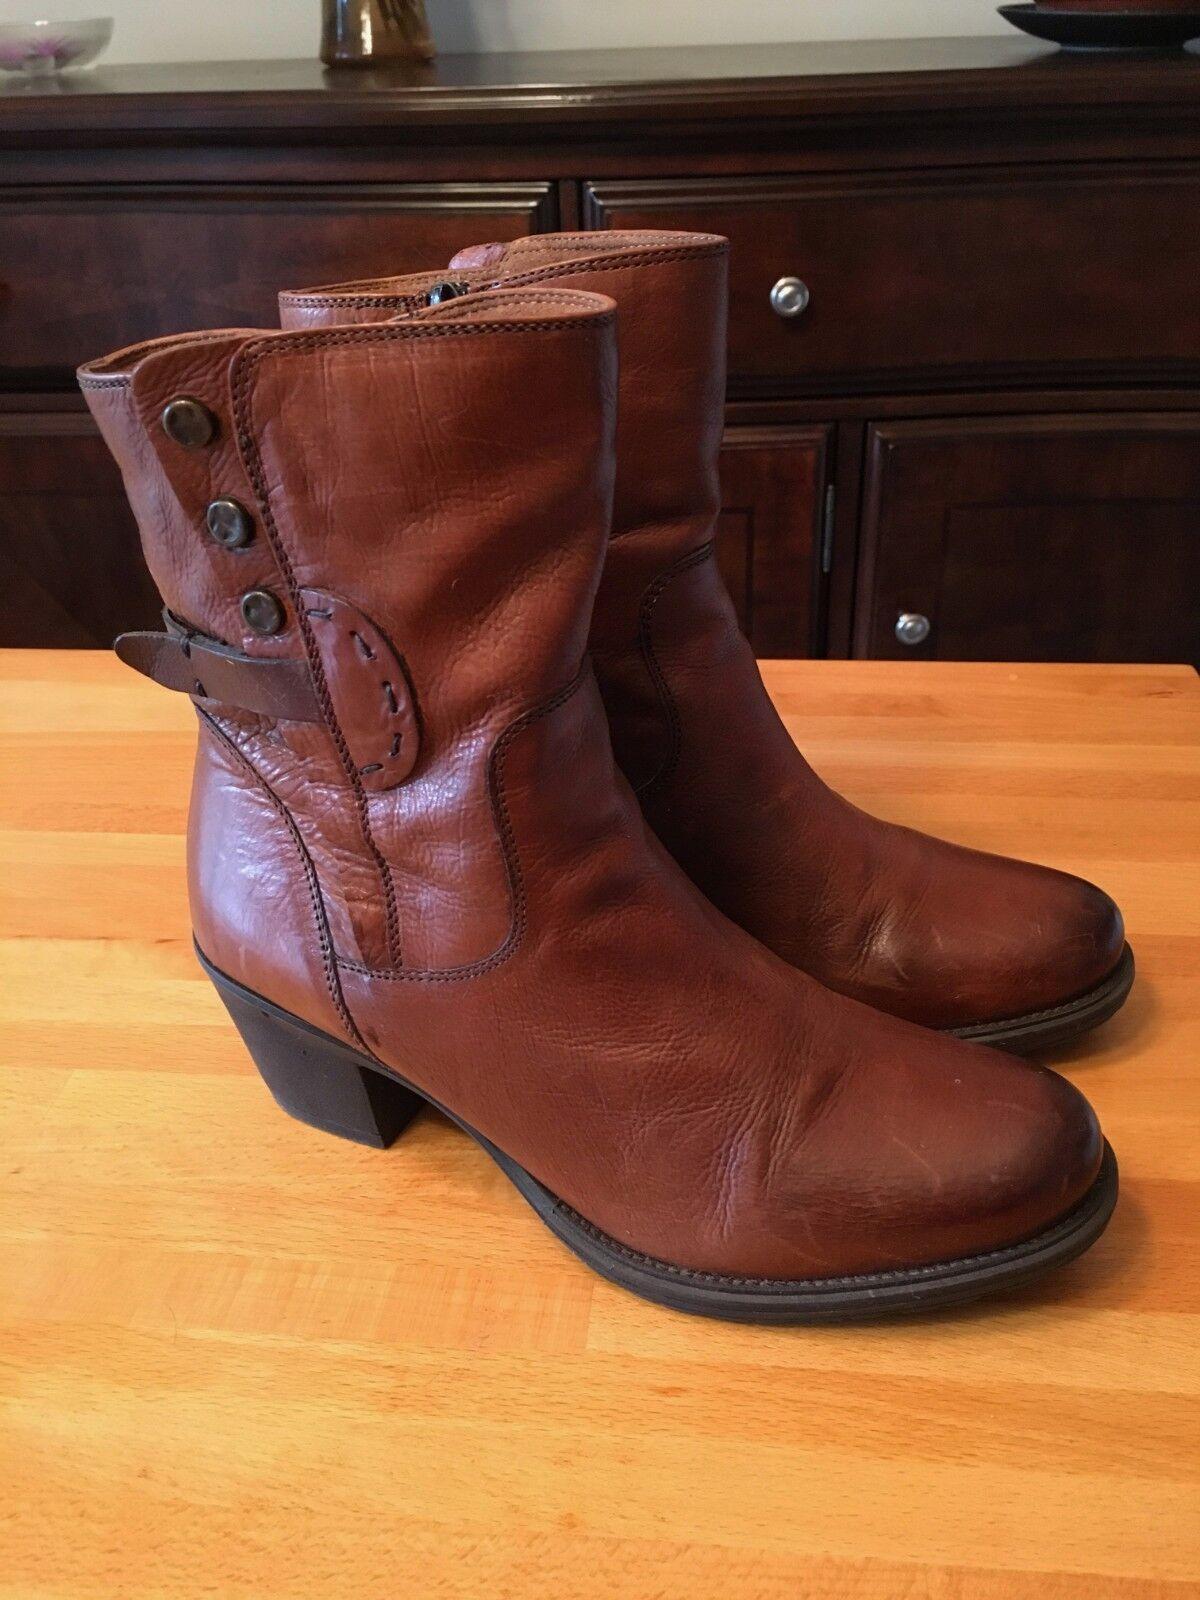 Clarks Maymie Skye Tan Leather Boots Size 7.5